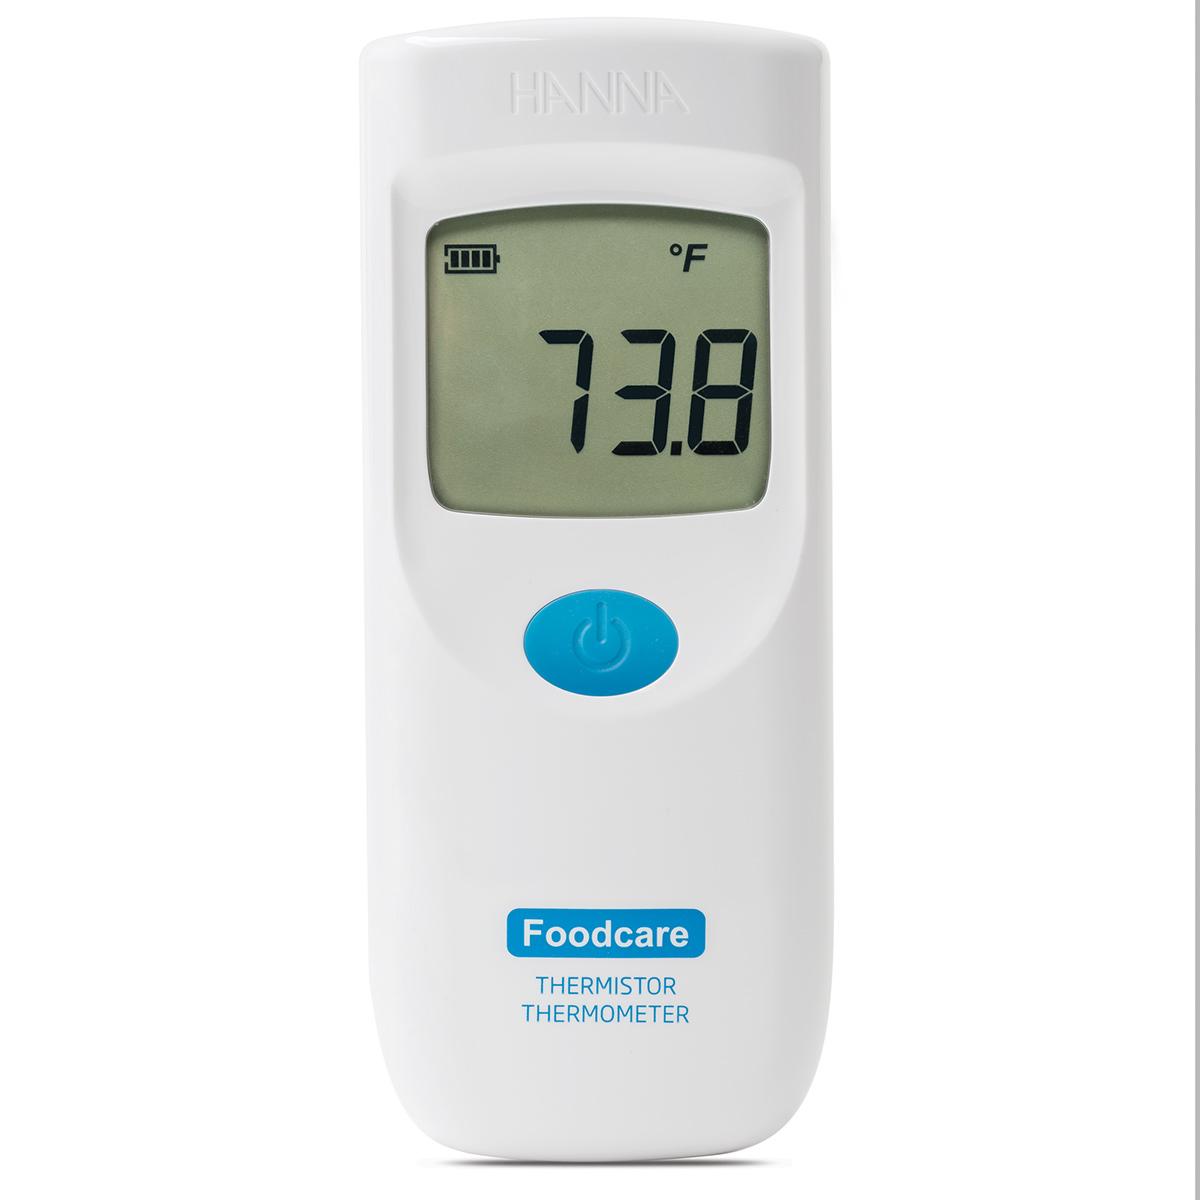 Termómetro Termistor para Alimentos - HI93501r